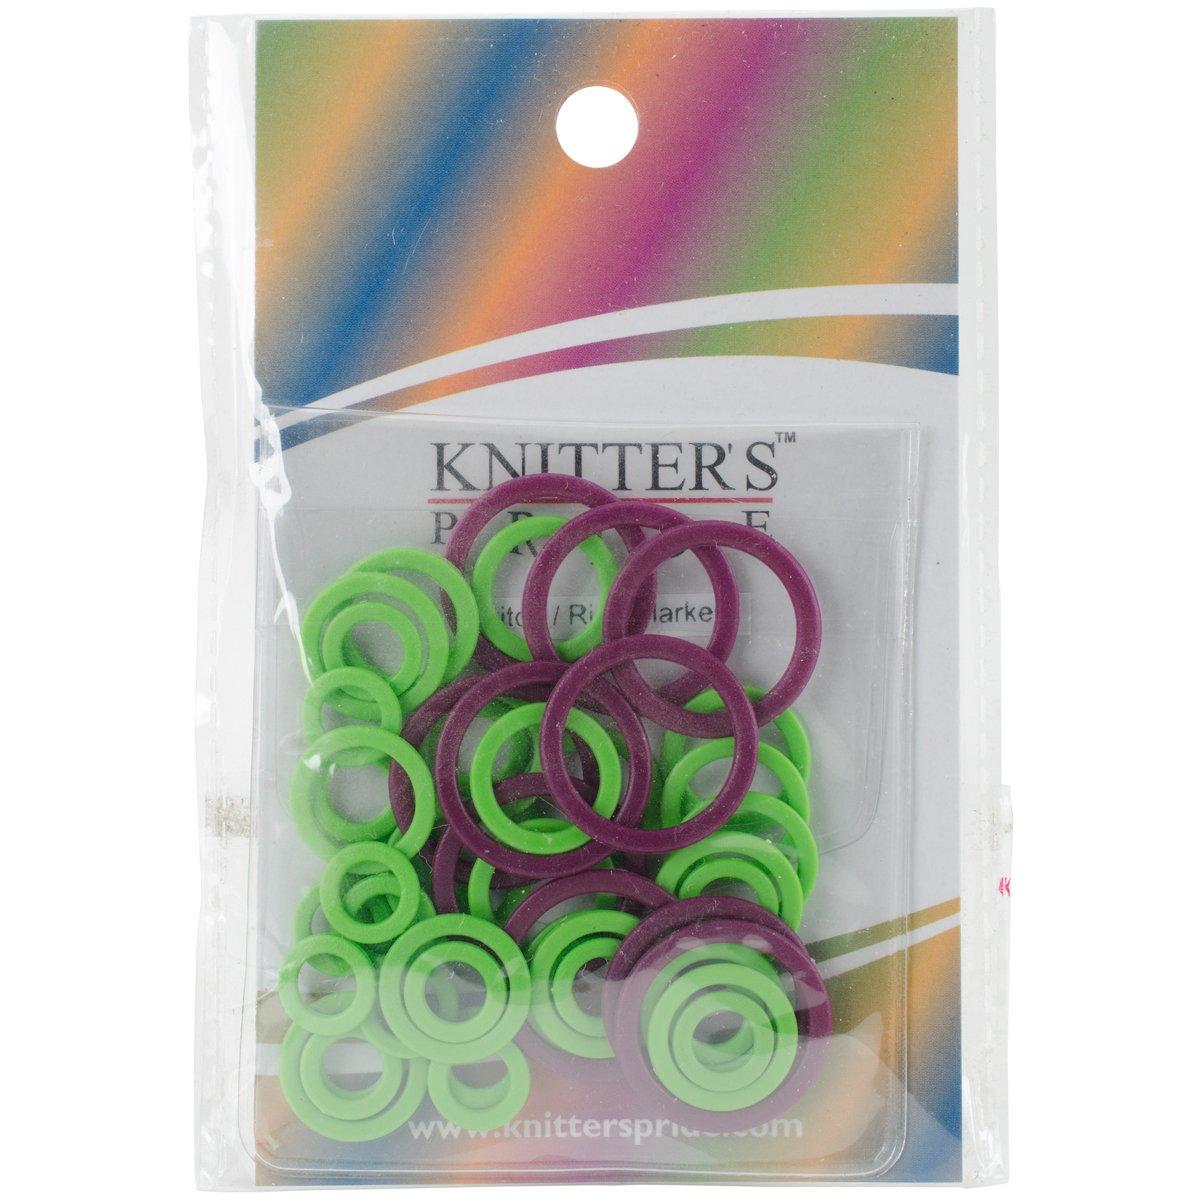 Knitter's Pride Stitch Ring Mio Stitch Markers 800171 Knitter' s Pride 4336923696